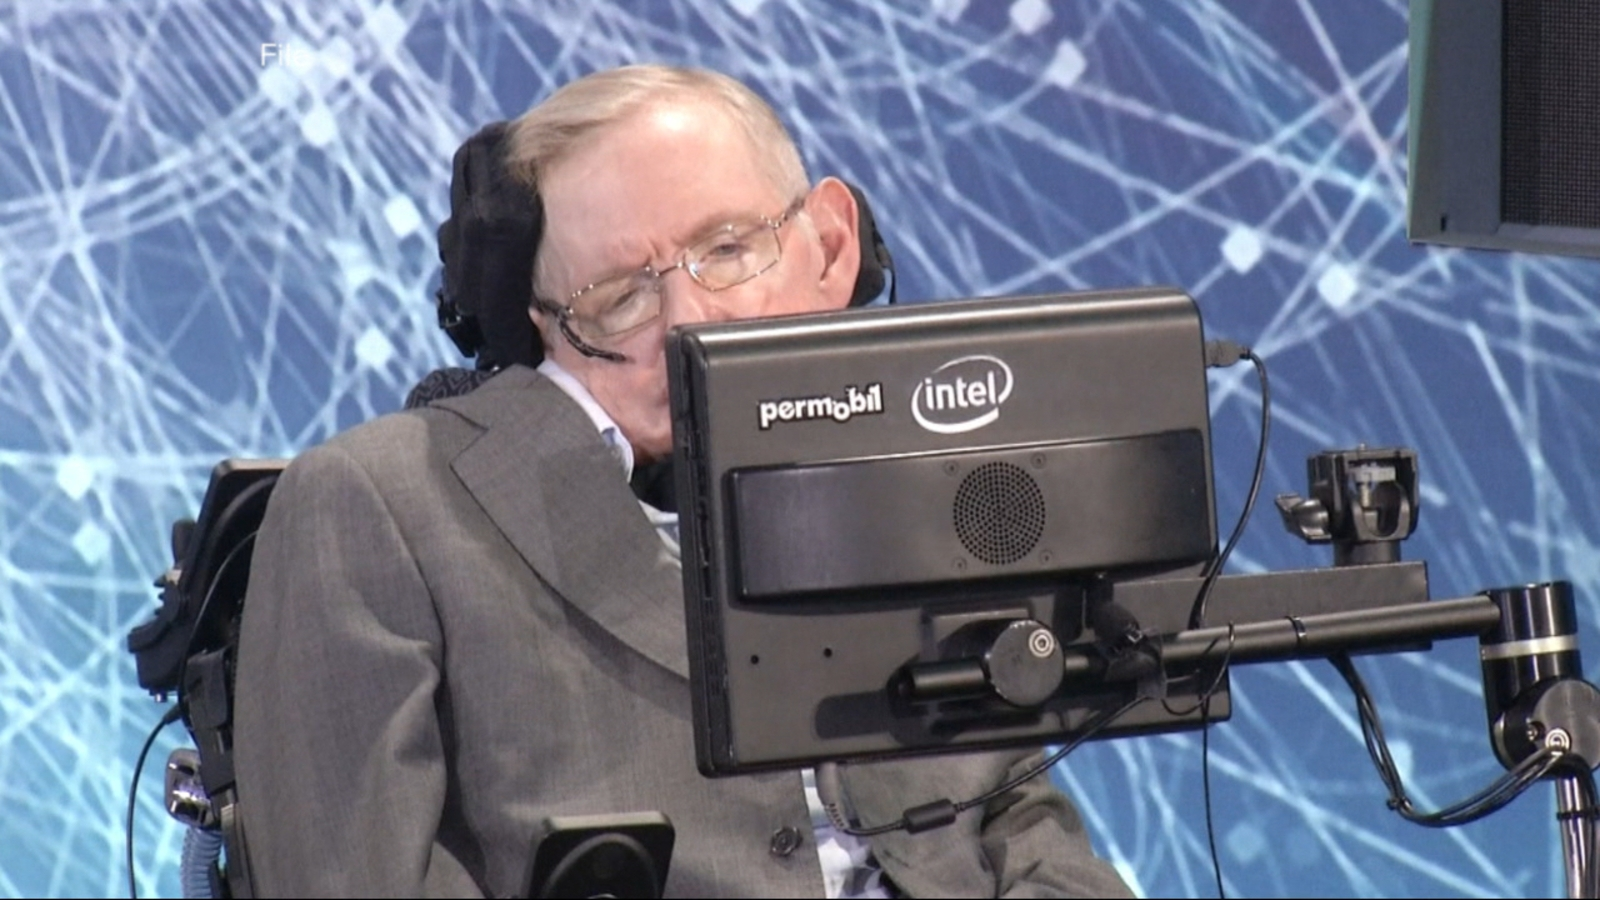 VIDEO: World-renowned British physicist Stephen Hawking may understand ...